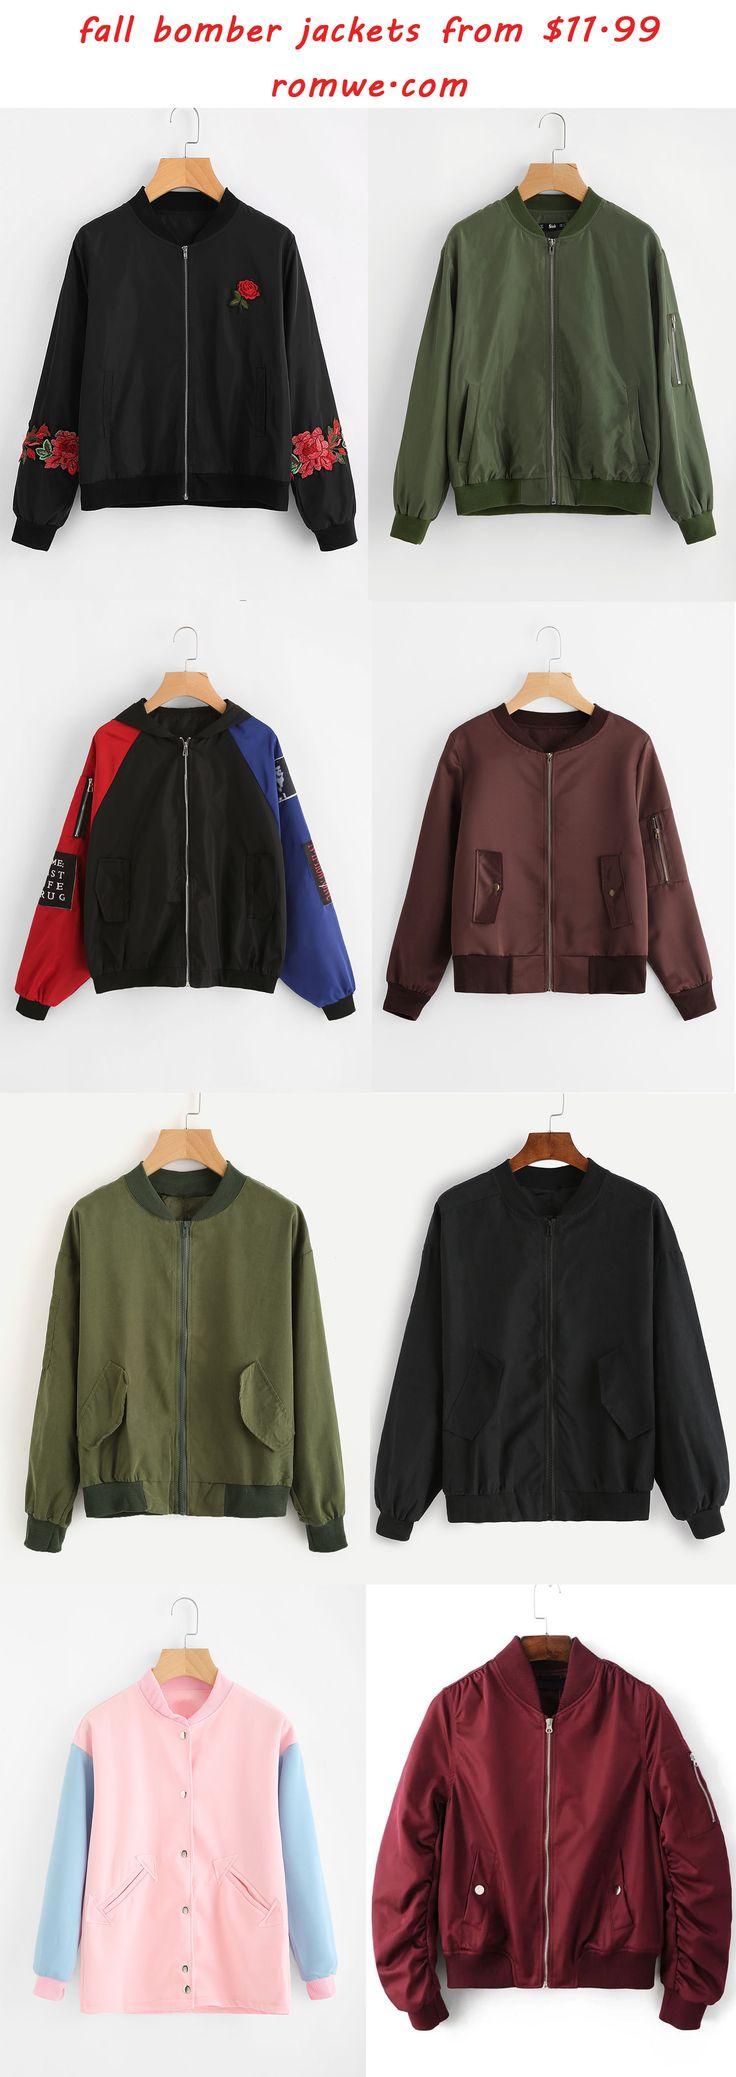 bomber jackets 2017 - romwe.com